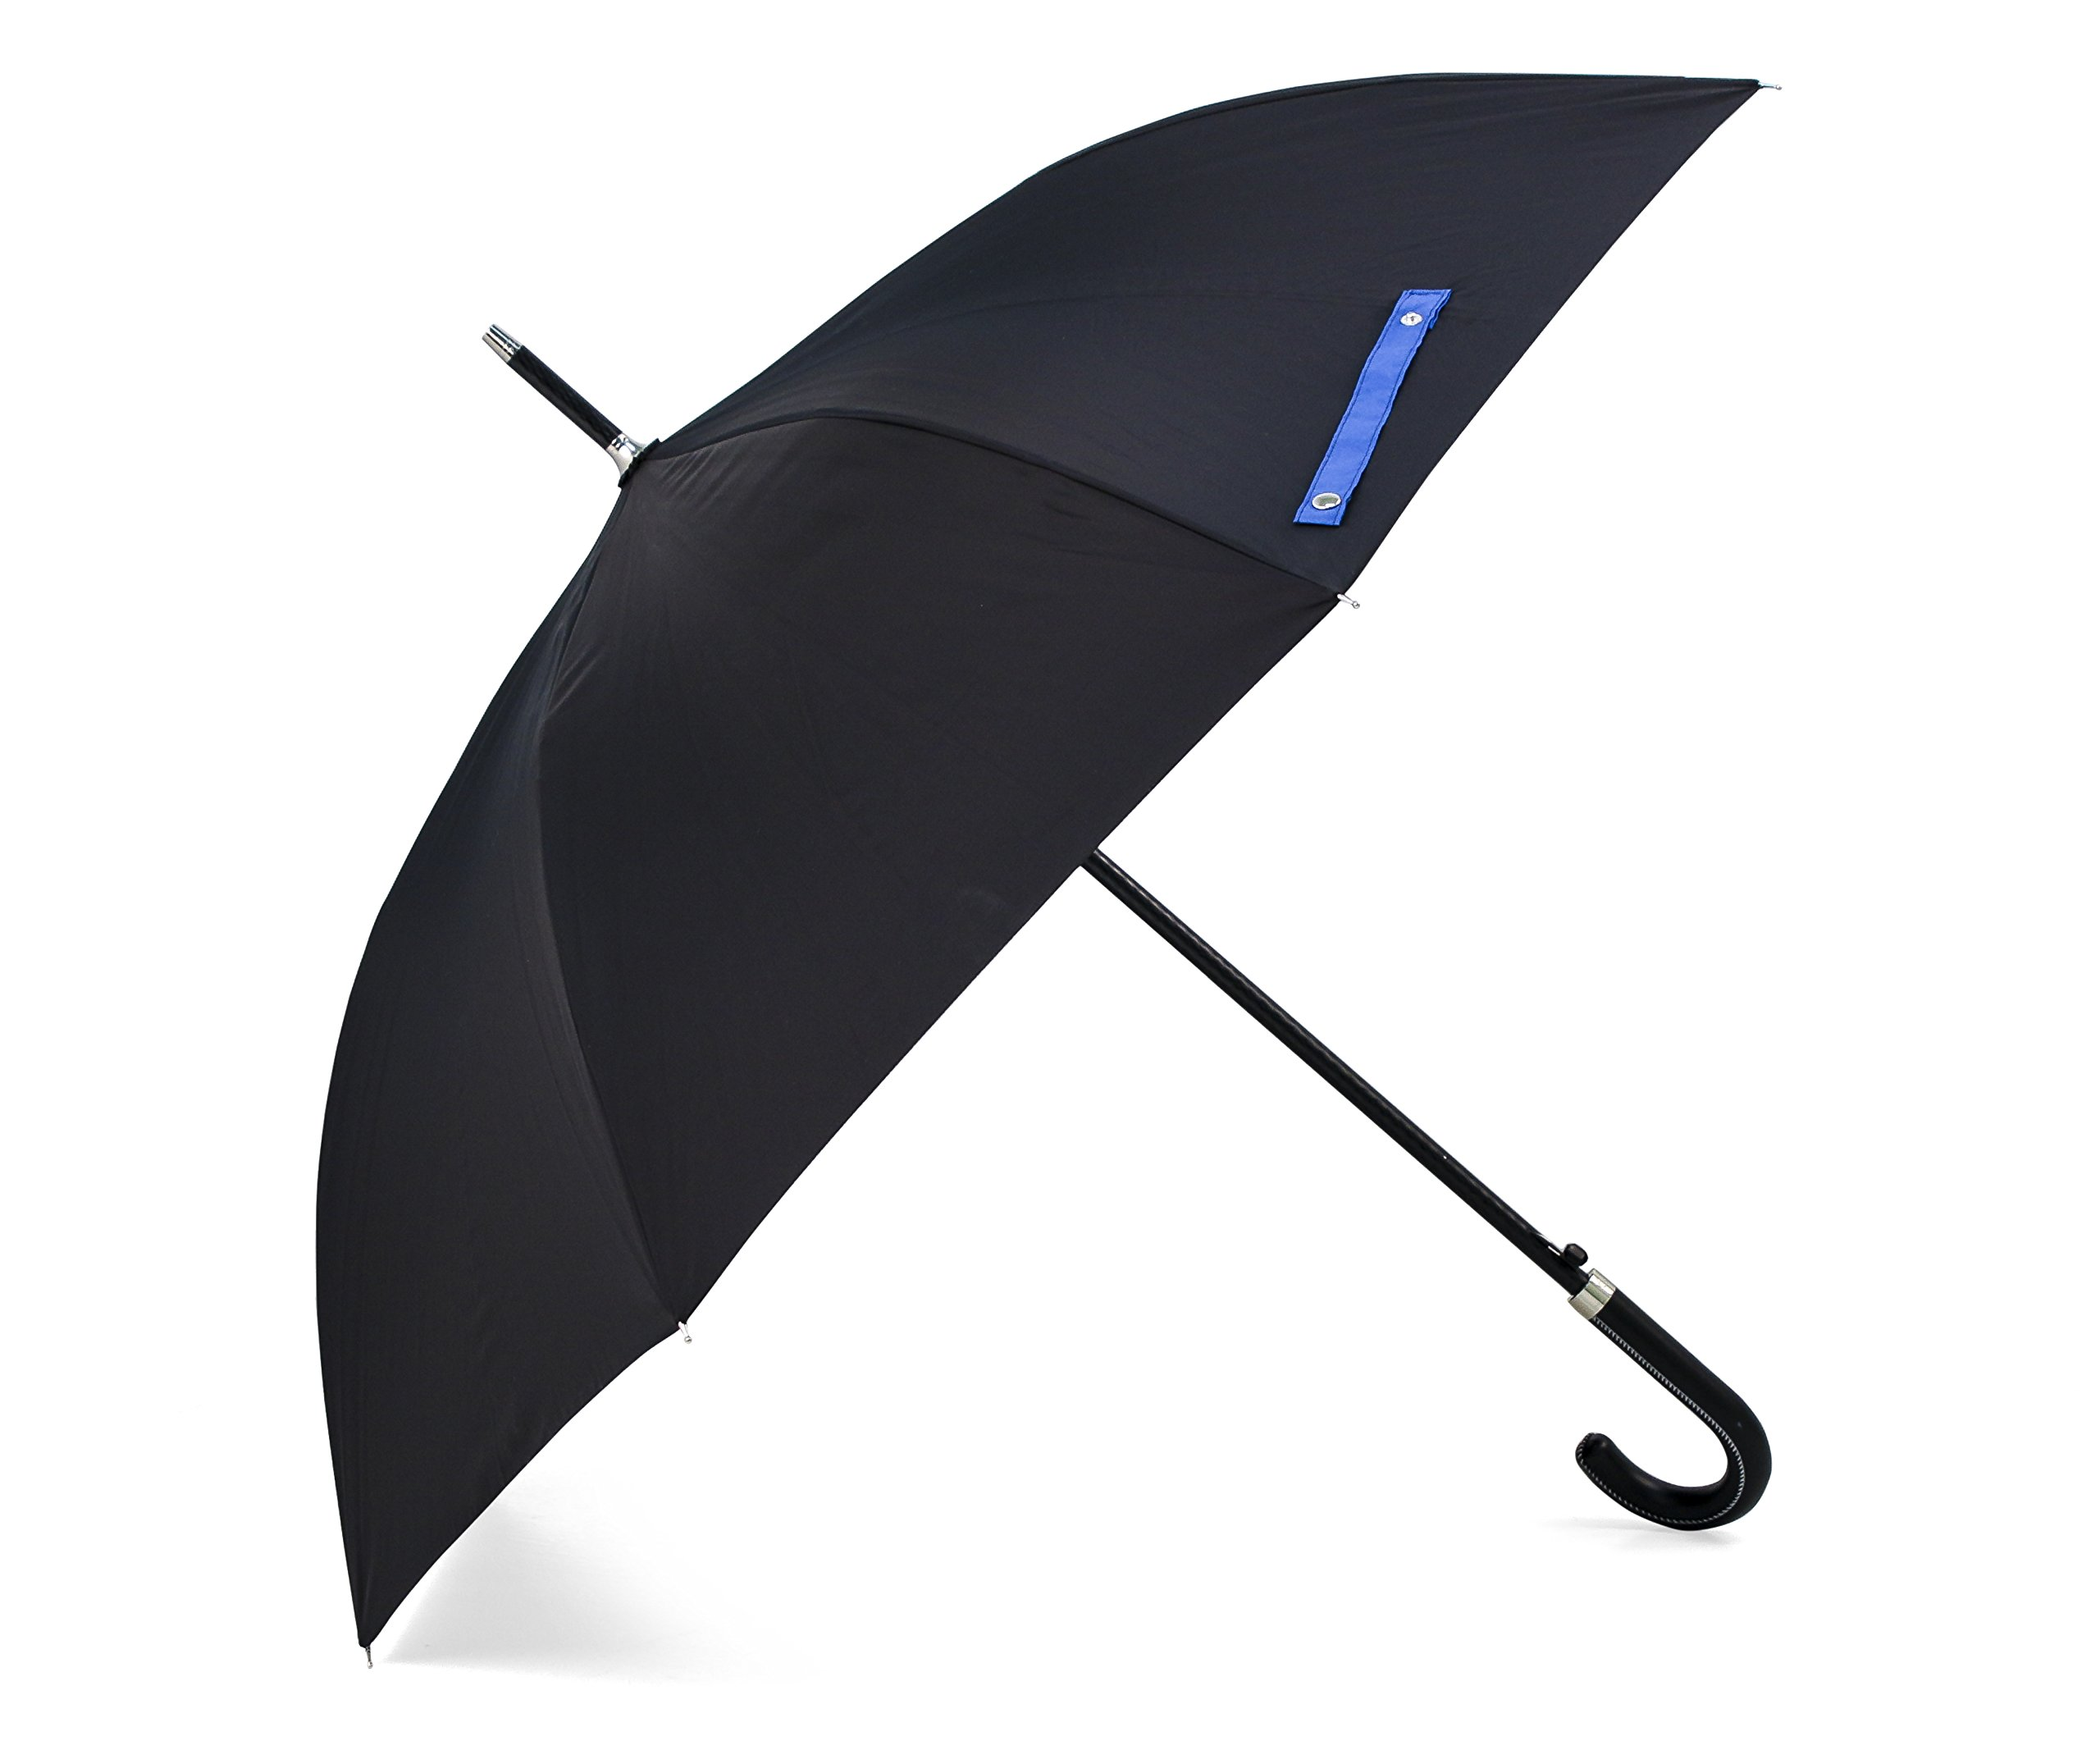 BlackAOG DESIGN Auto Open 100% Fiberglass Stick Umbrella with Stylish J-Hook Handle,Black,One Size